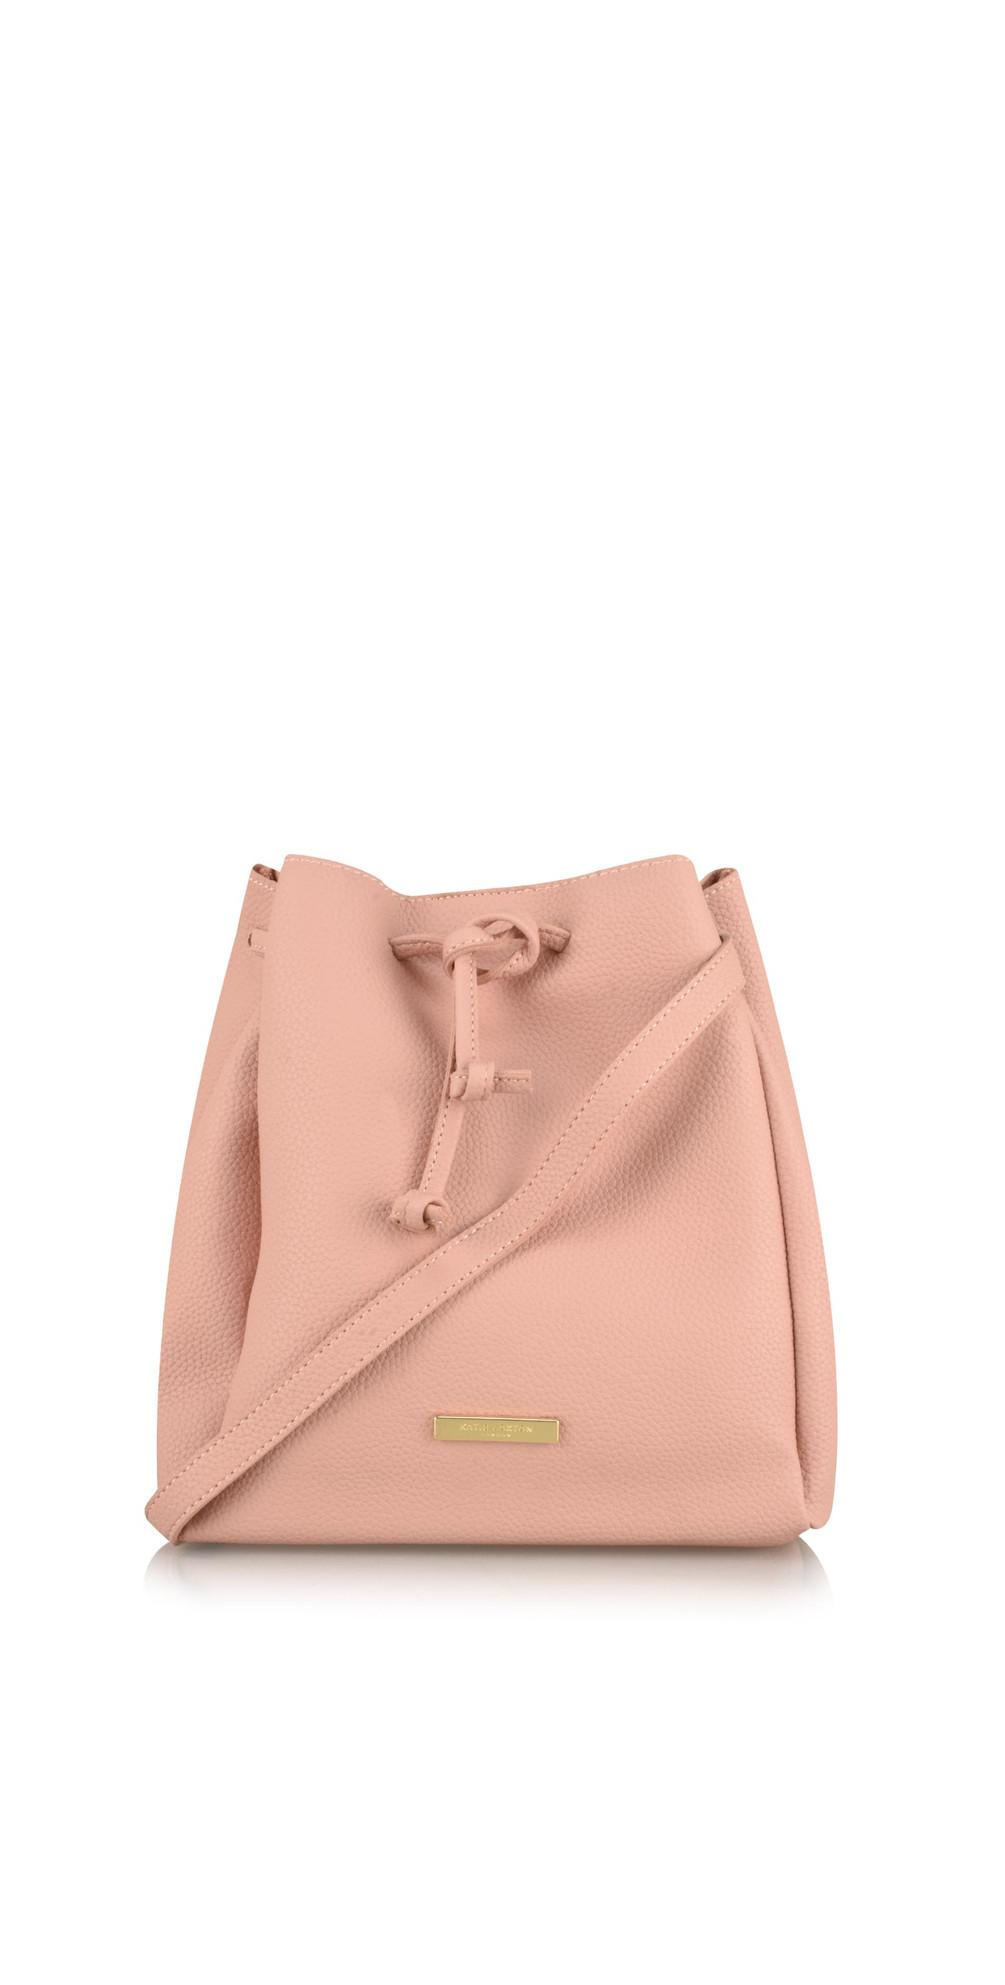 5c63f309a3 Katie Loxton Chloe Bucket Bag in Pale Pink